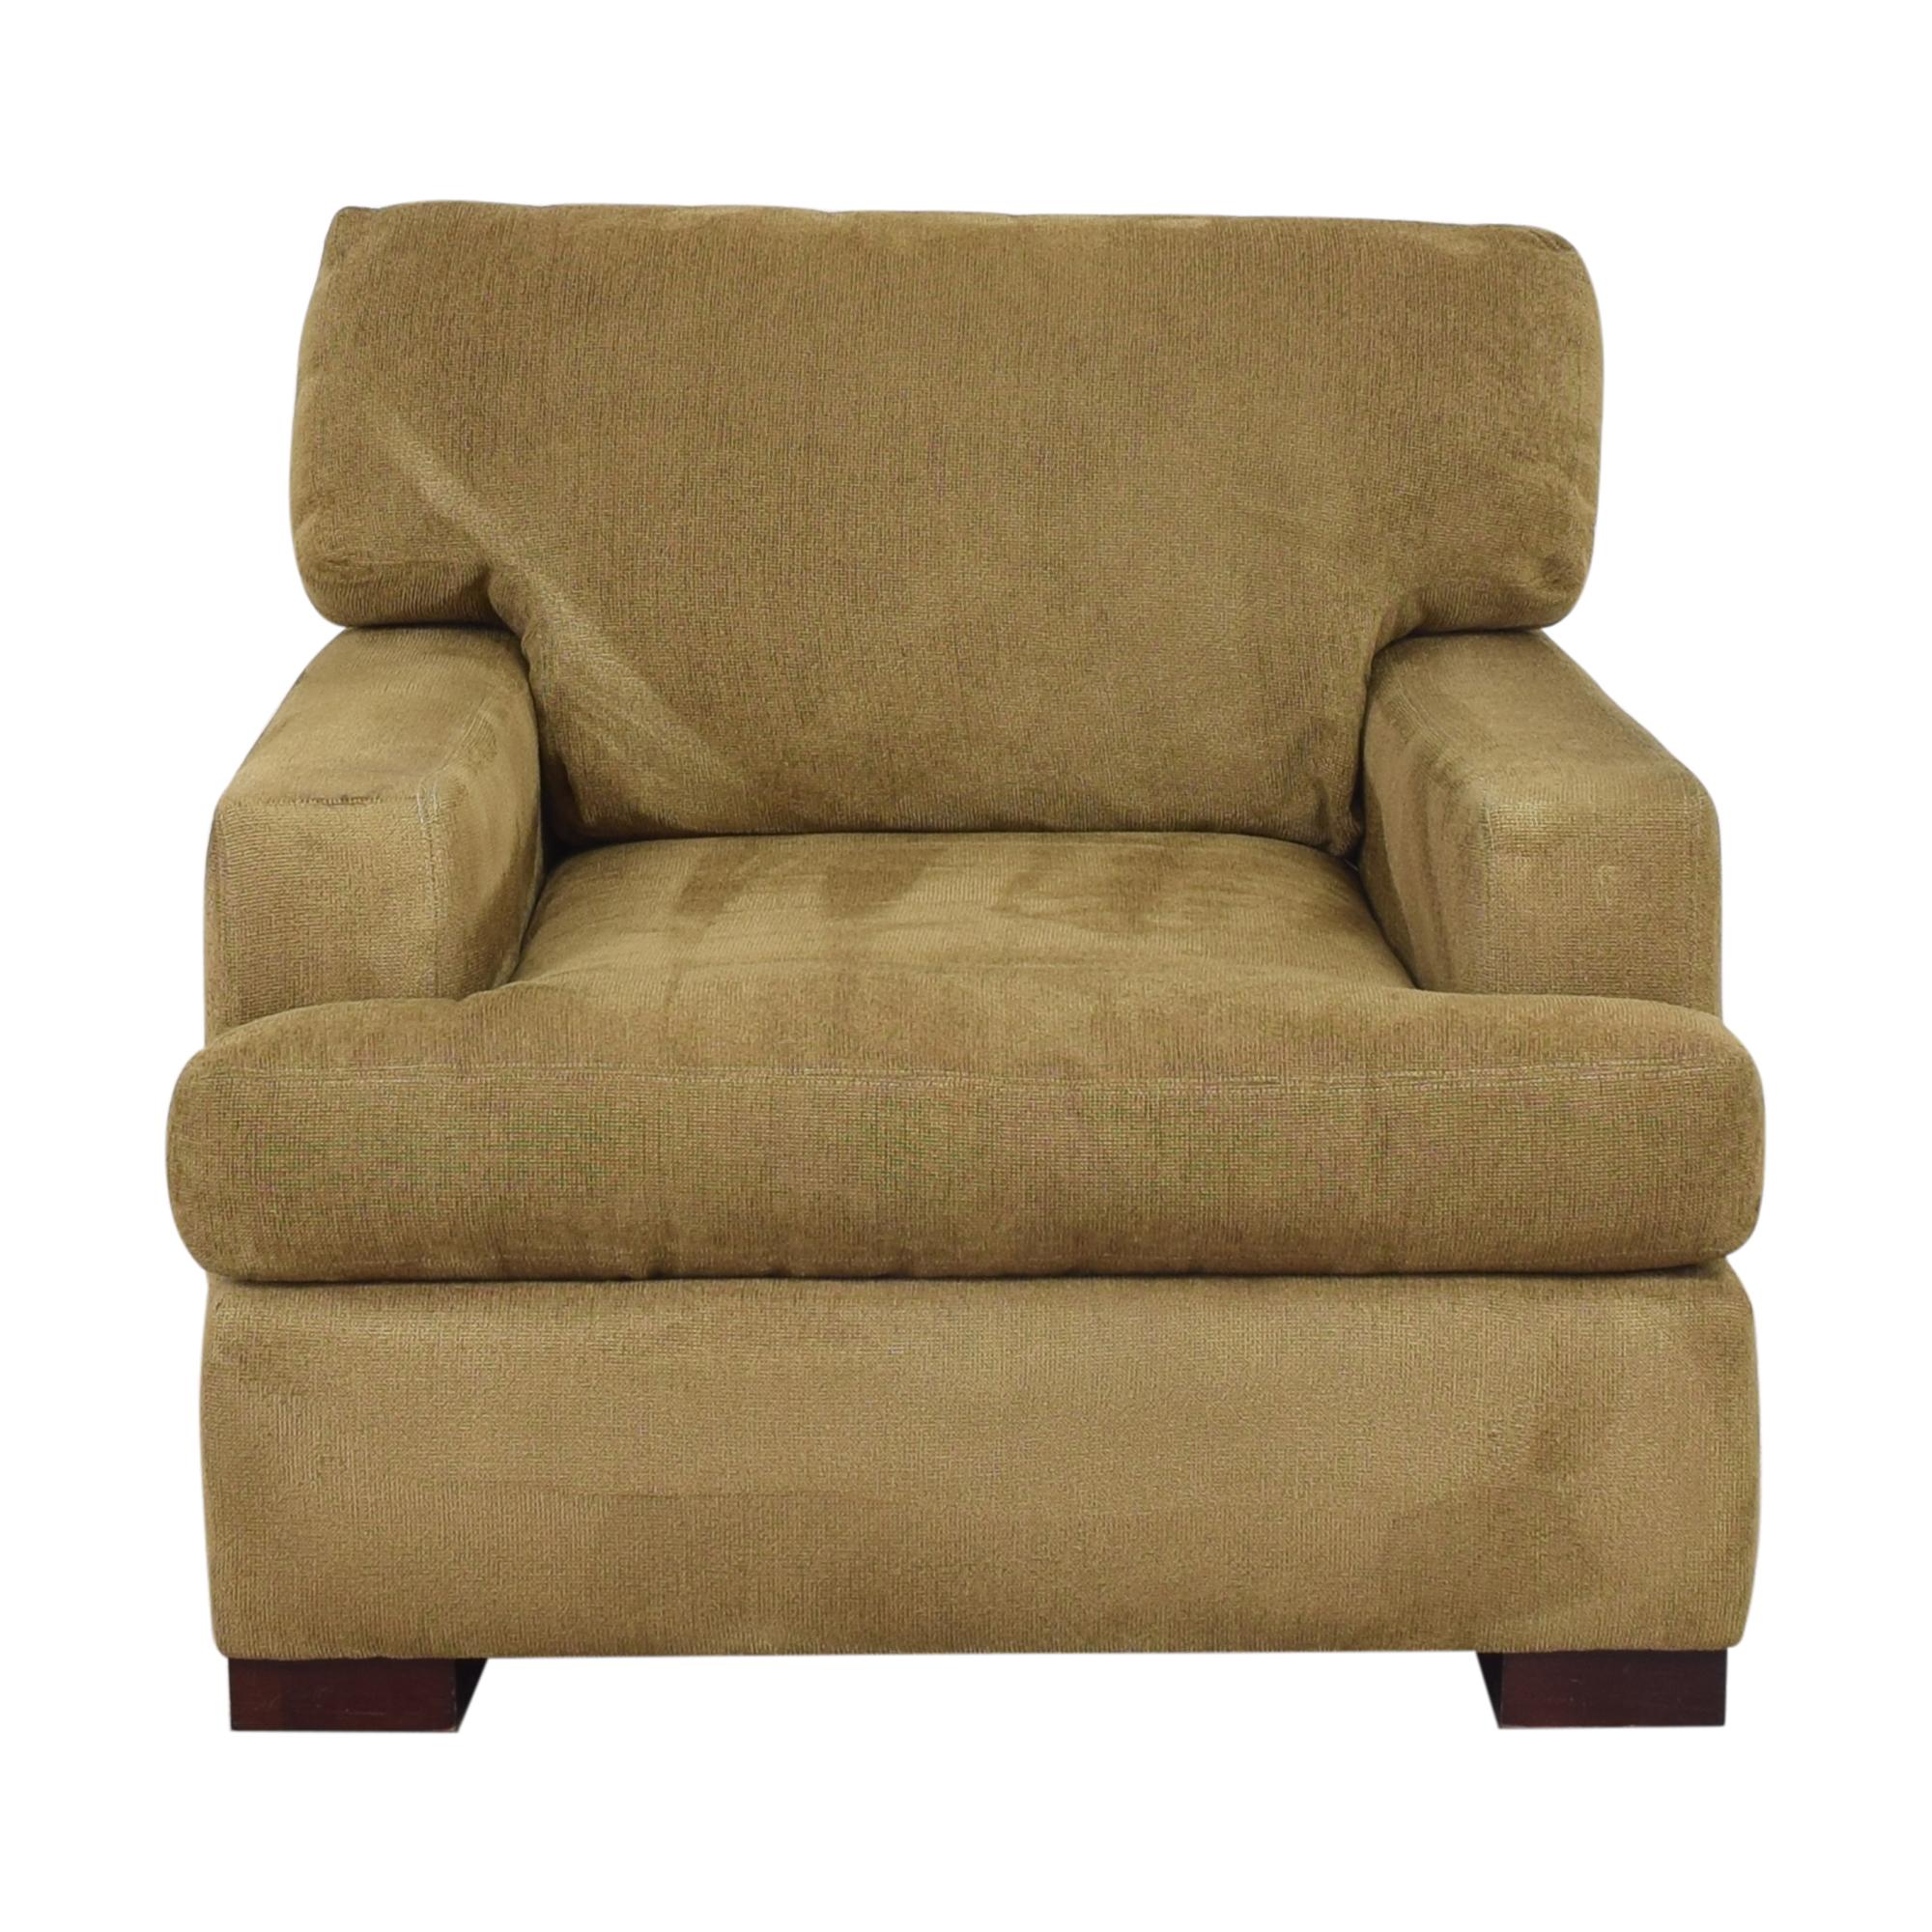 Crate & Barrel Crate & Barrel Club Chair Chairs